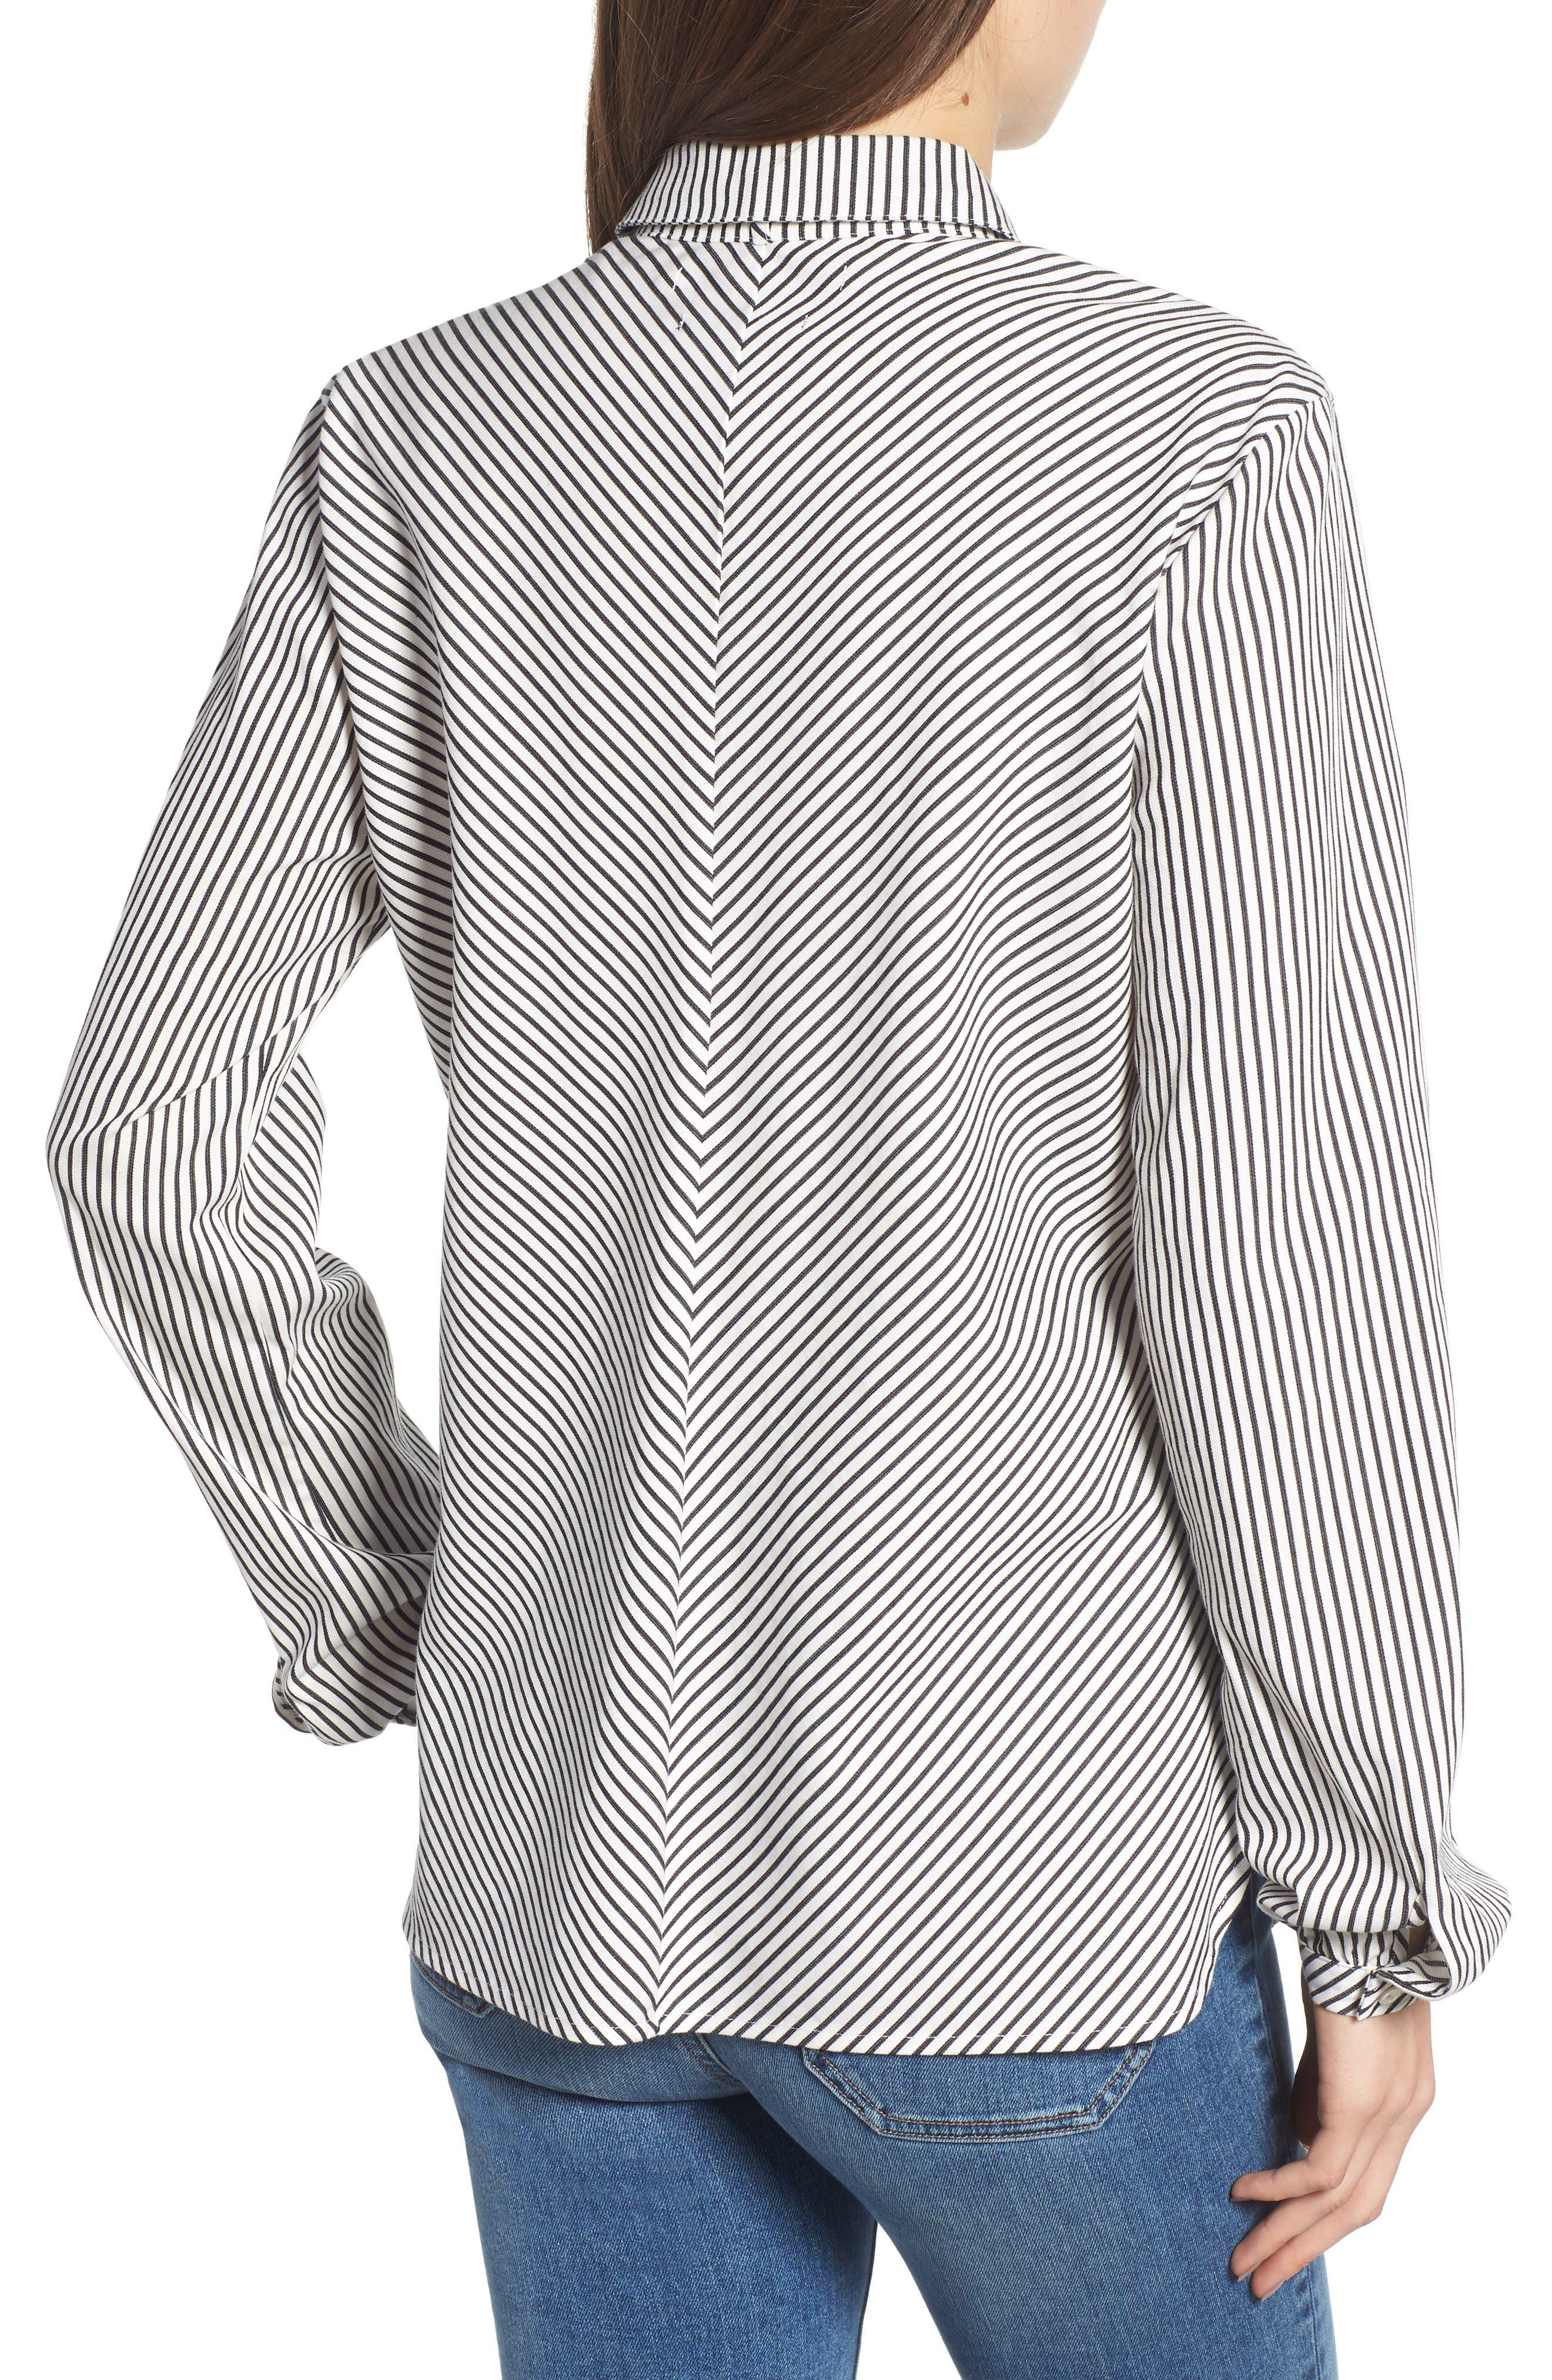 Stripe Pleat Shirt,                             Alternate thumbnail 2, color,                             BLACK/ WHITE PIN STRIPE